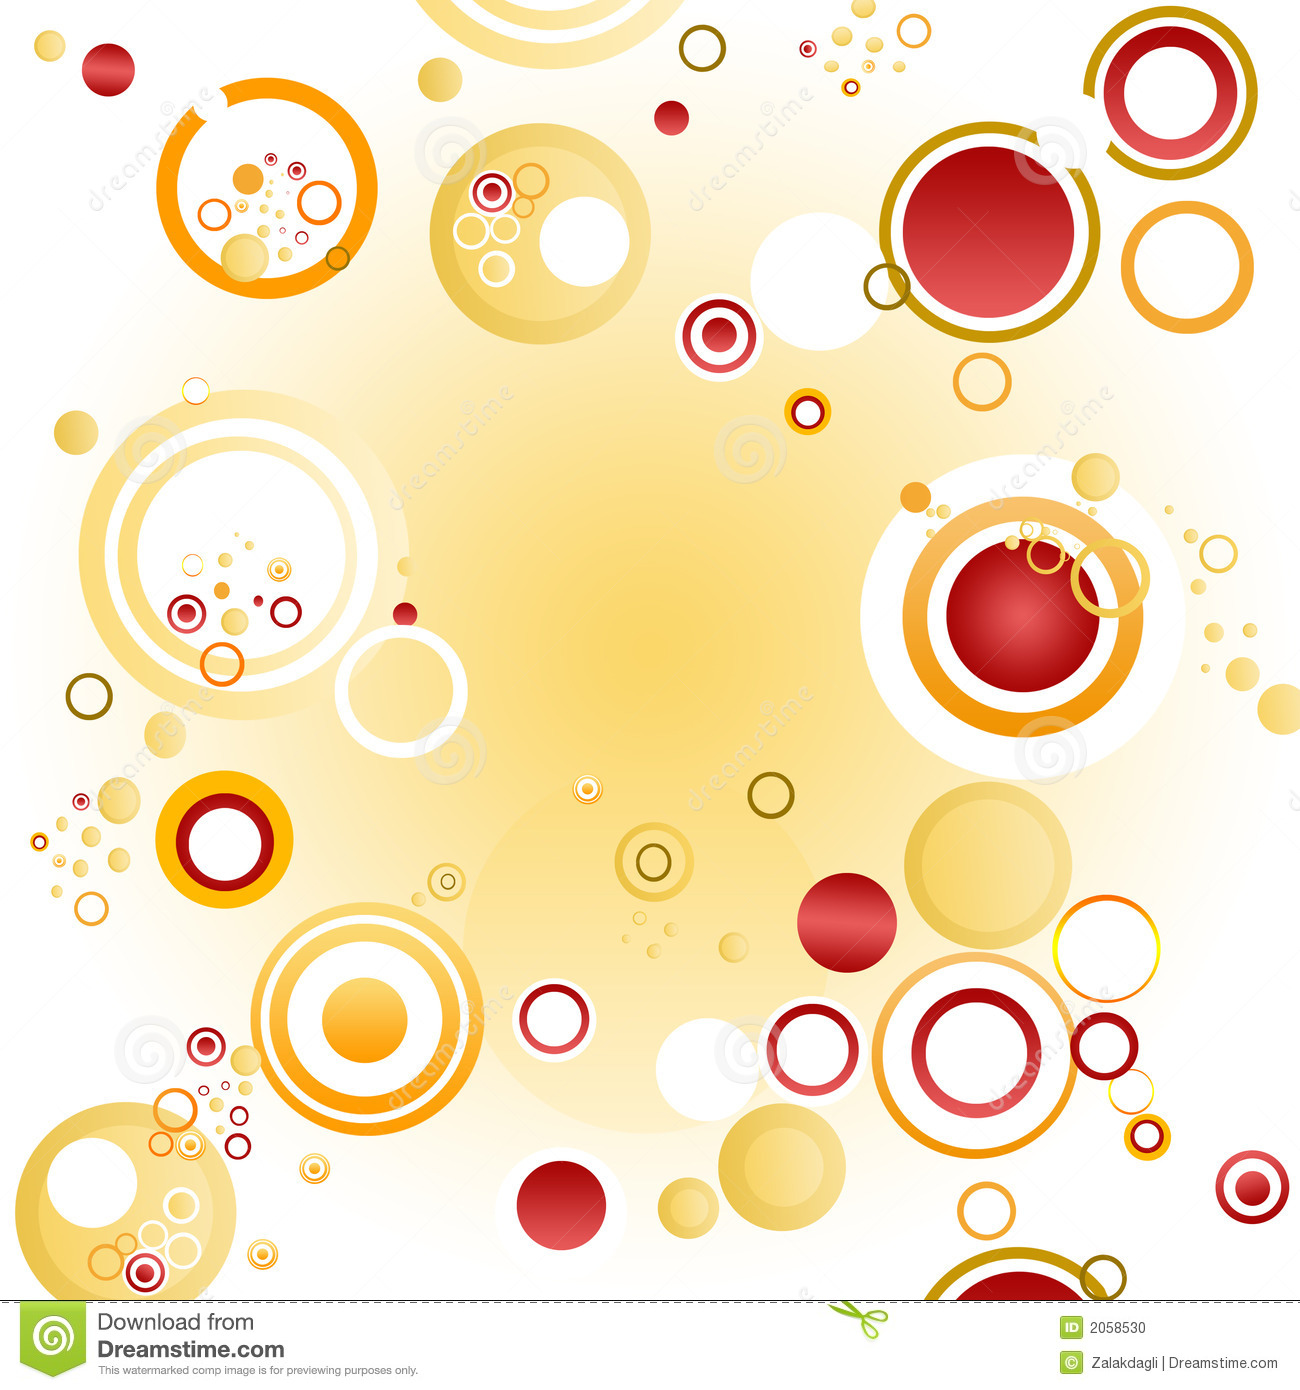 Art Background Designs : Clip art background designs clipart suggest